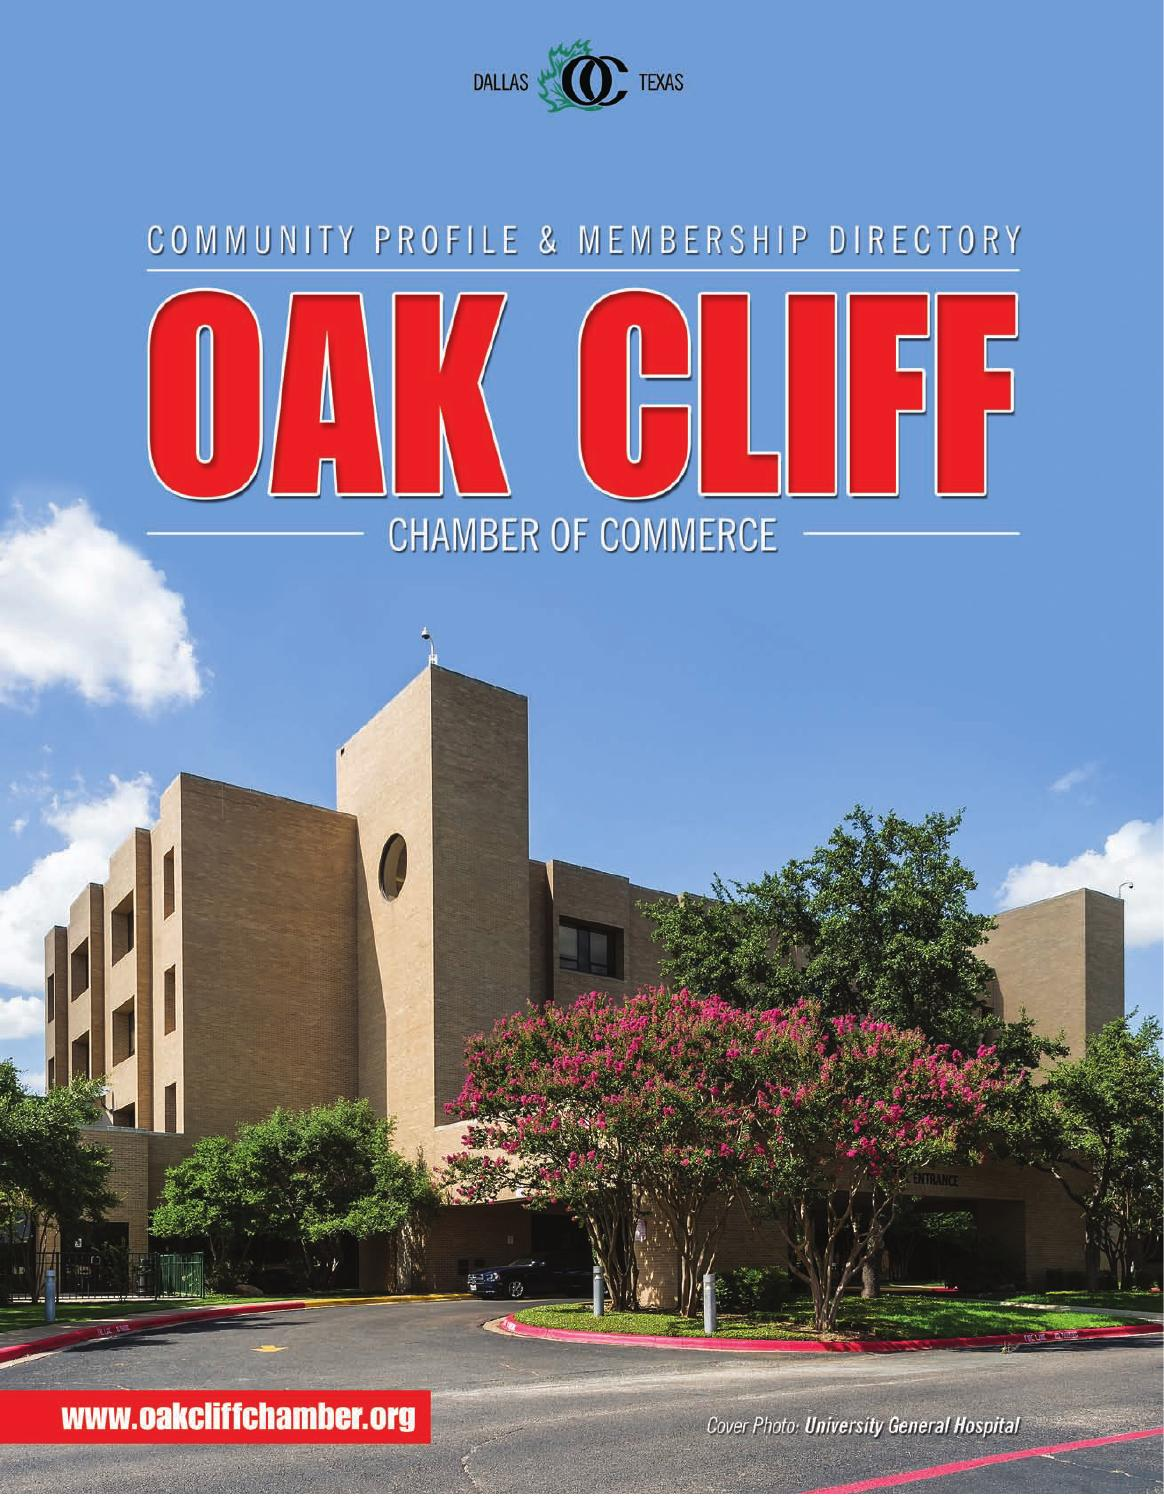 oak cliff resource center - HD1164×1496